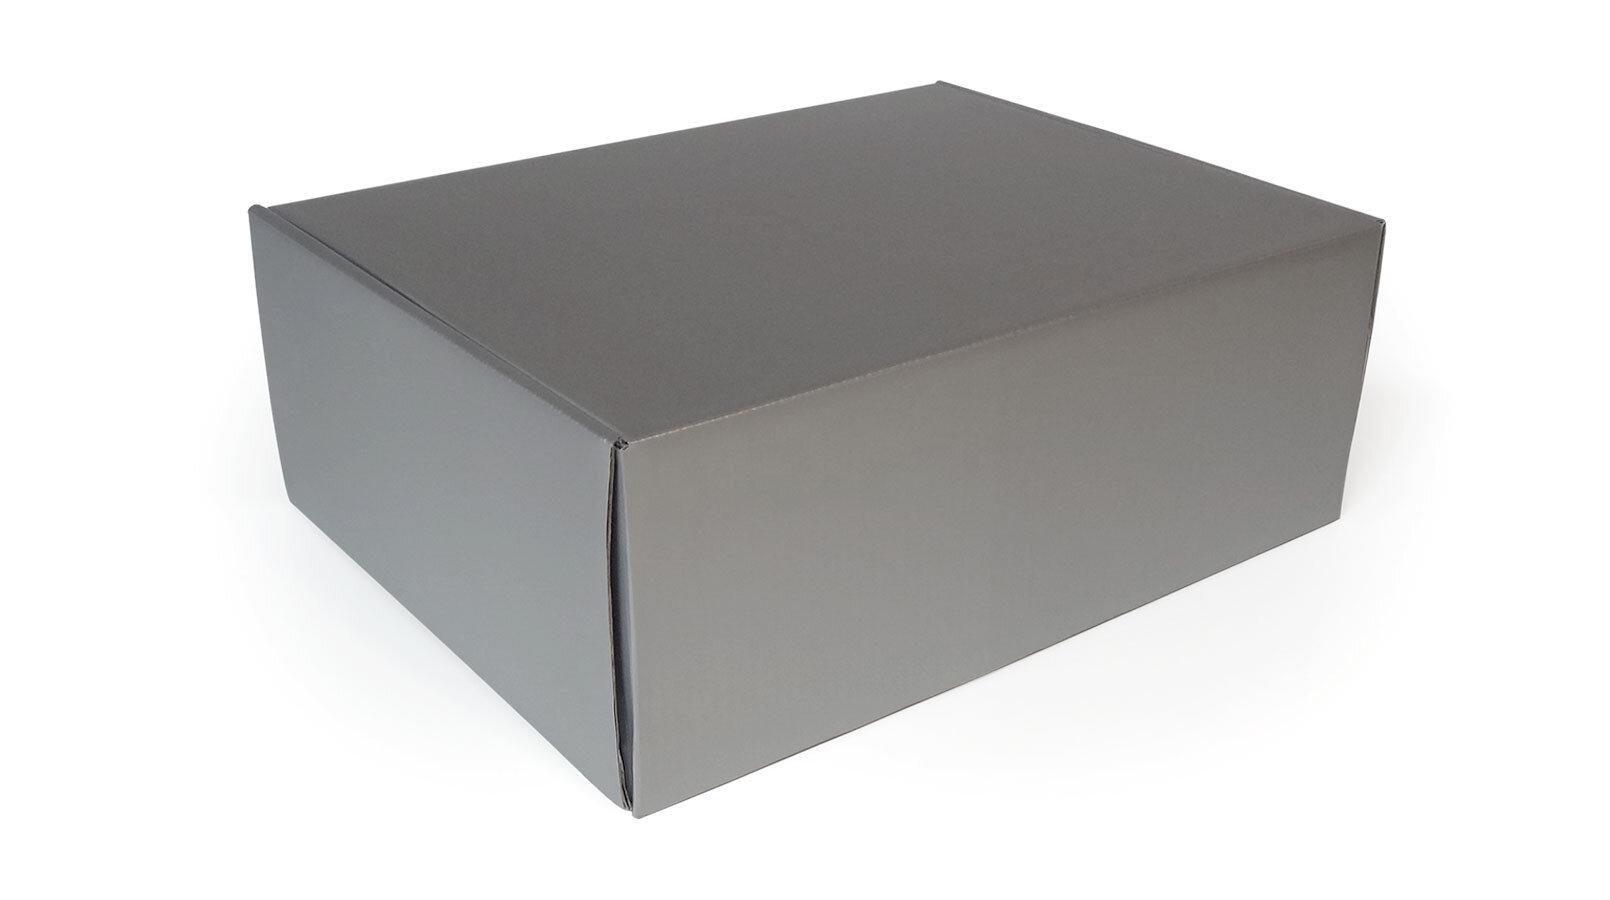 West-Elm-Box-Packaging-Company-Design-6.JPG